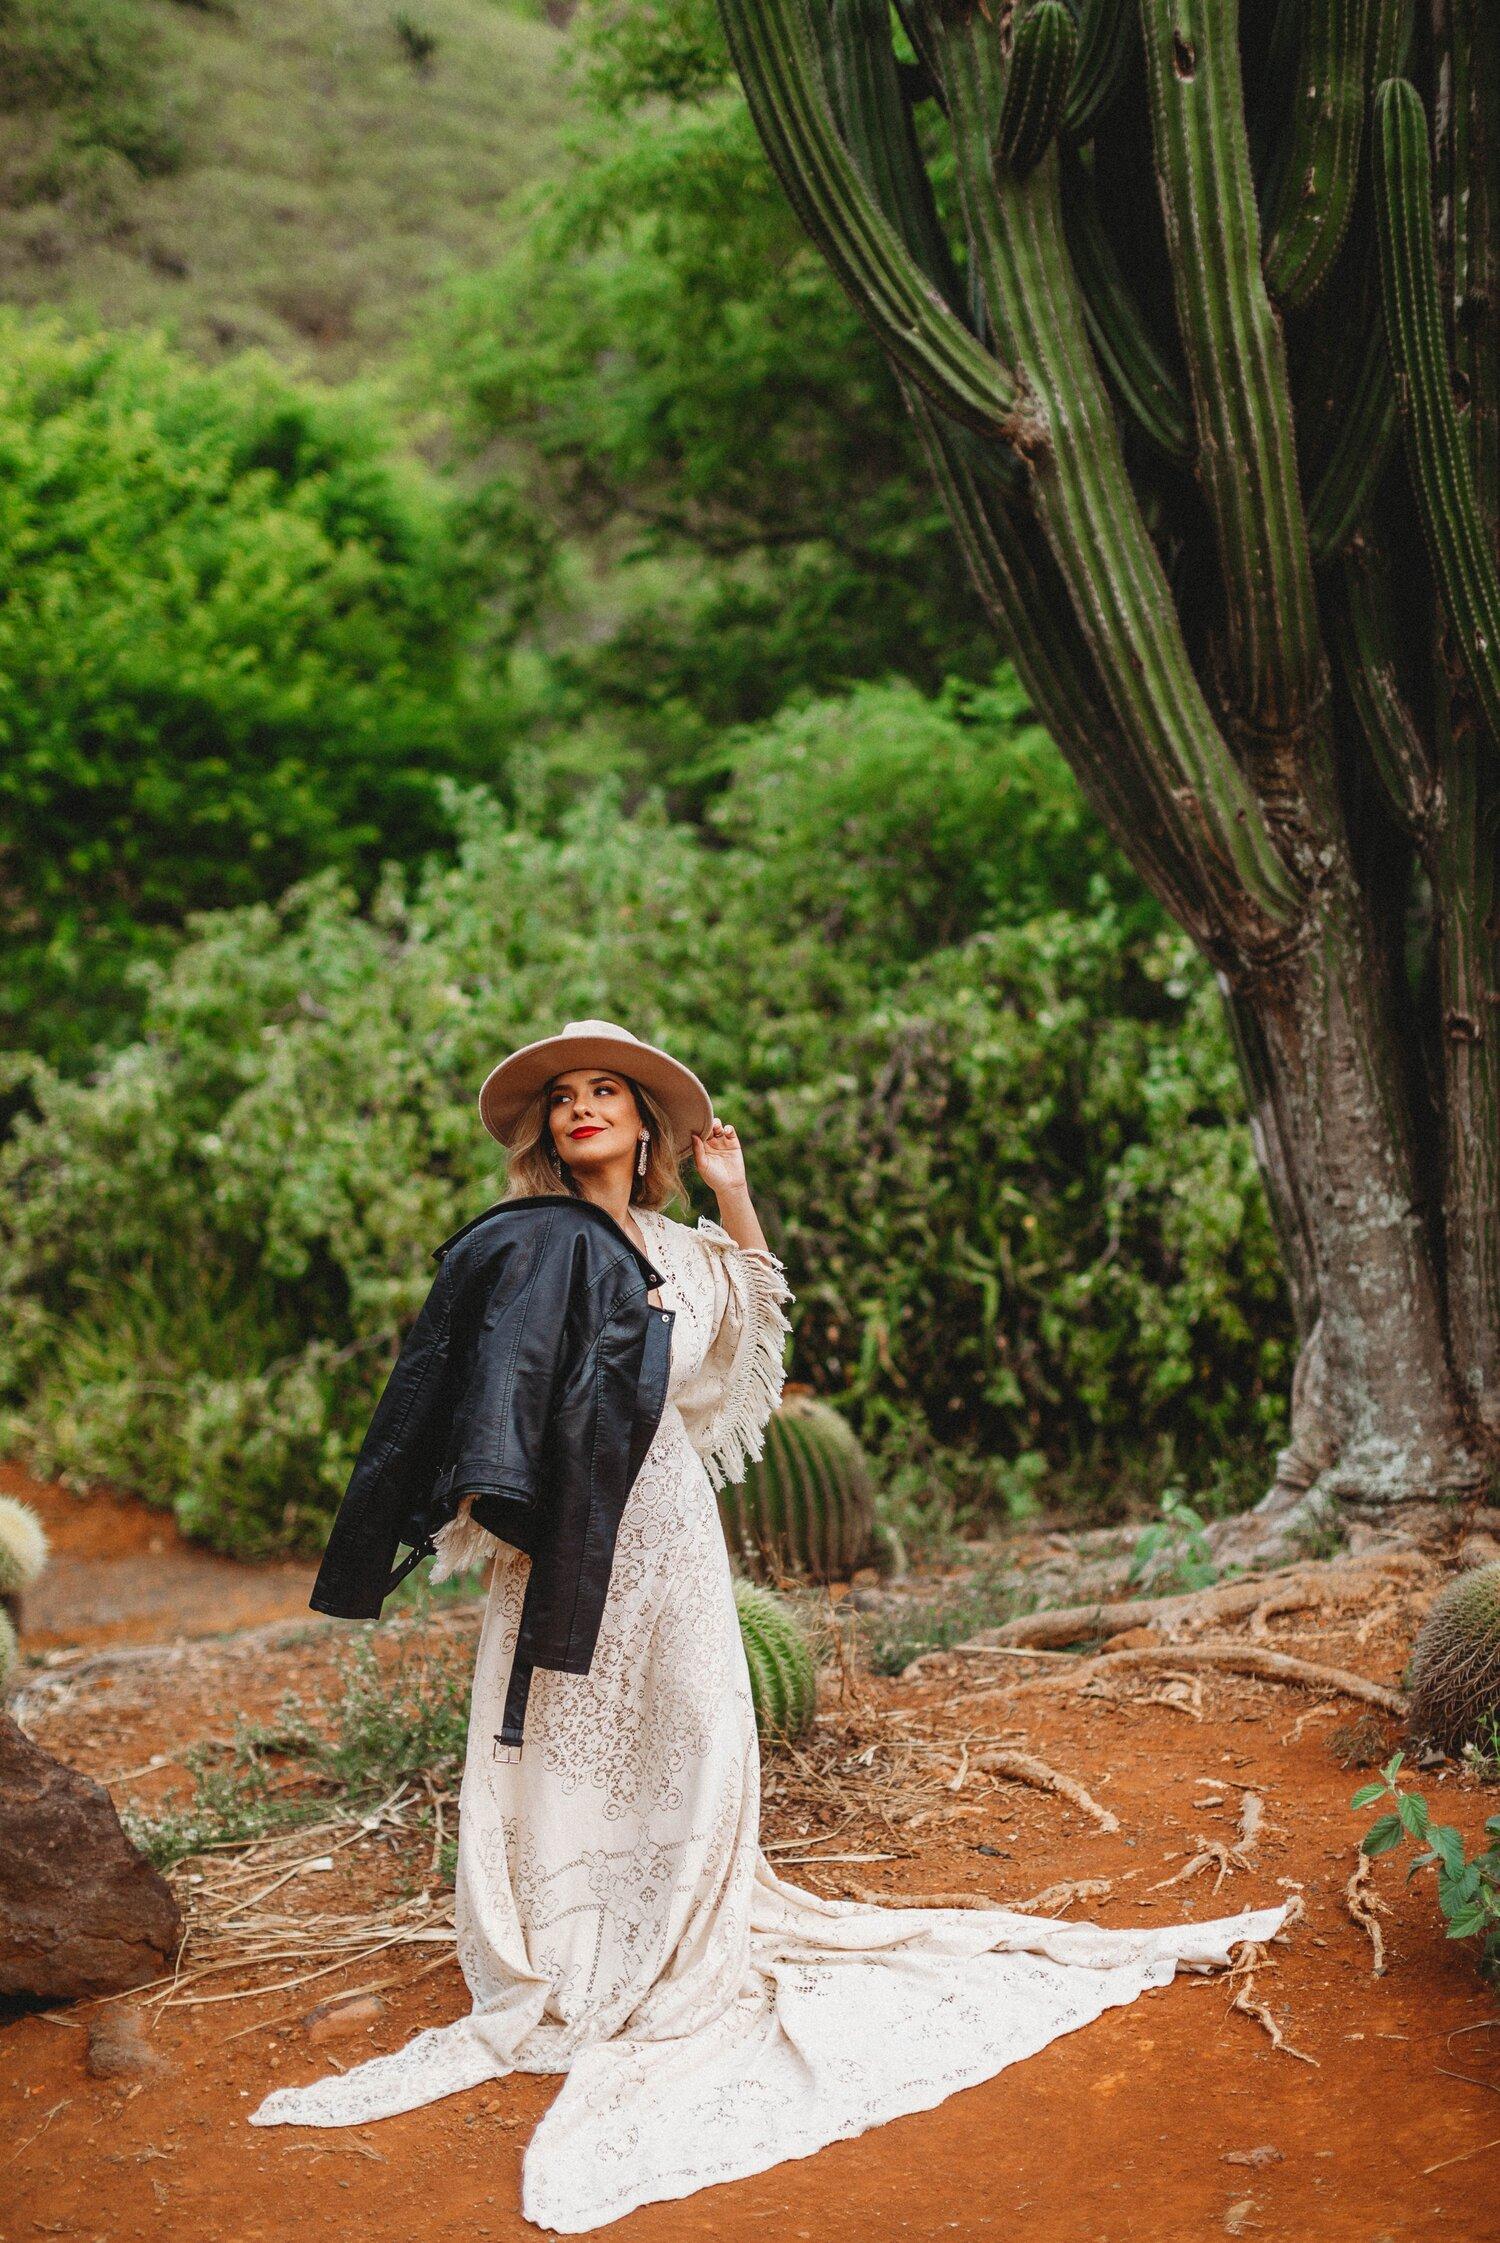 Boho Cactus Elopement - Honolulu, Koko Crater Botanical Garden - Oahu Hawaii Wedding Photographer 21.jpg